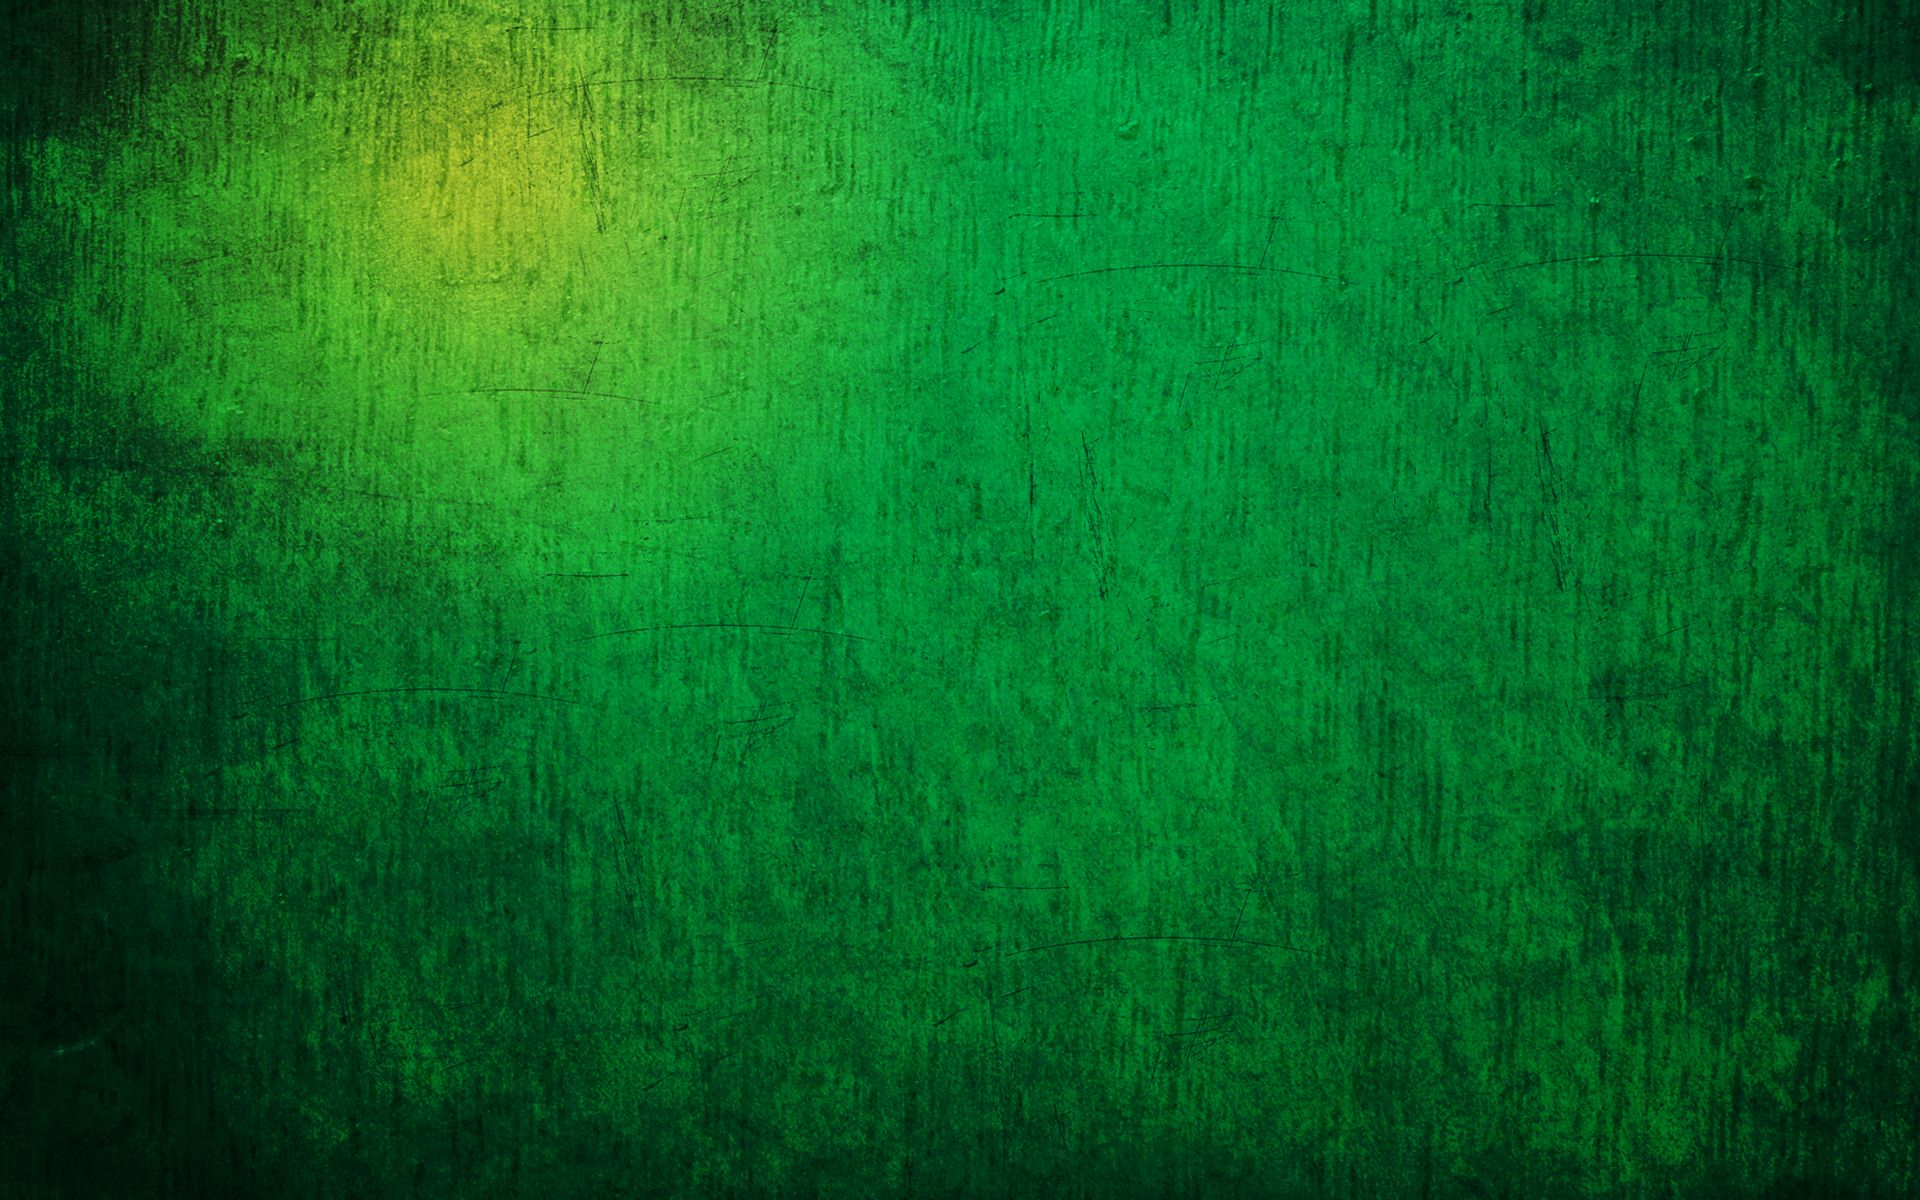 Wallpaper Hd Green